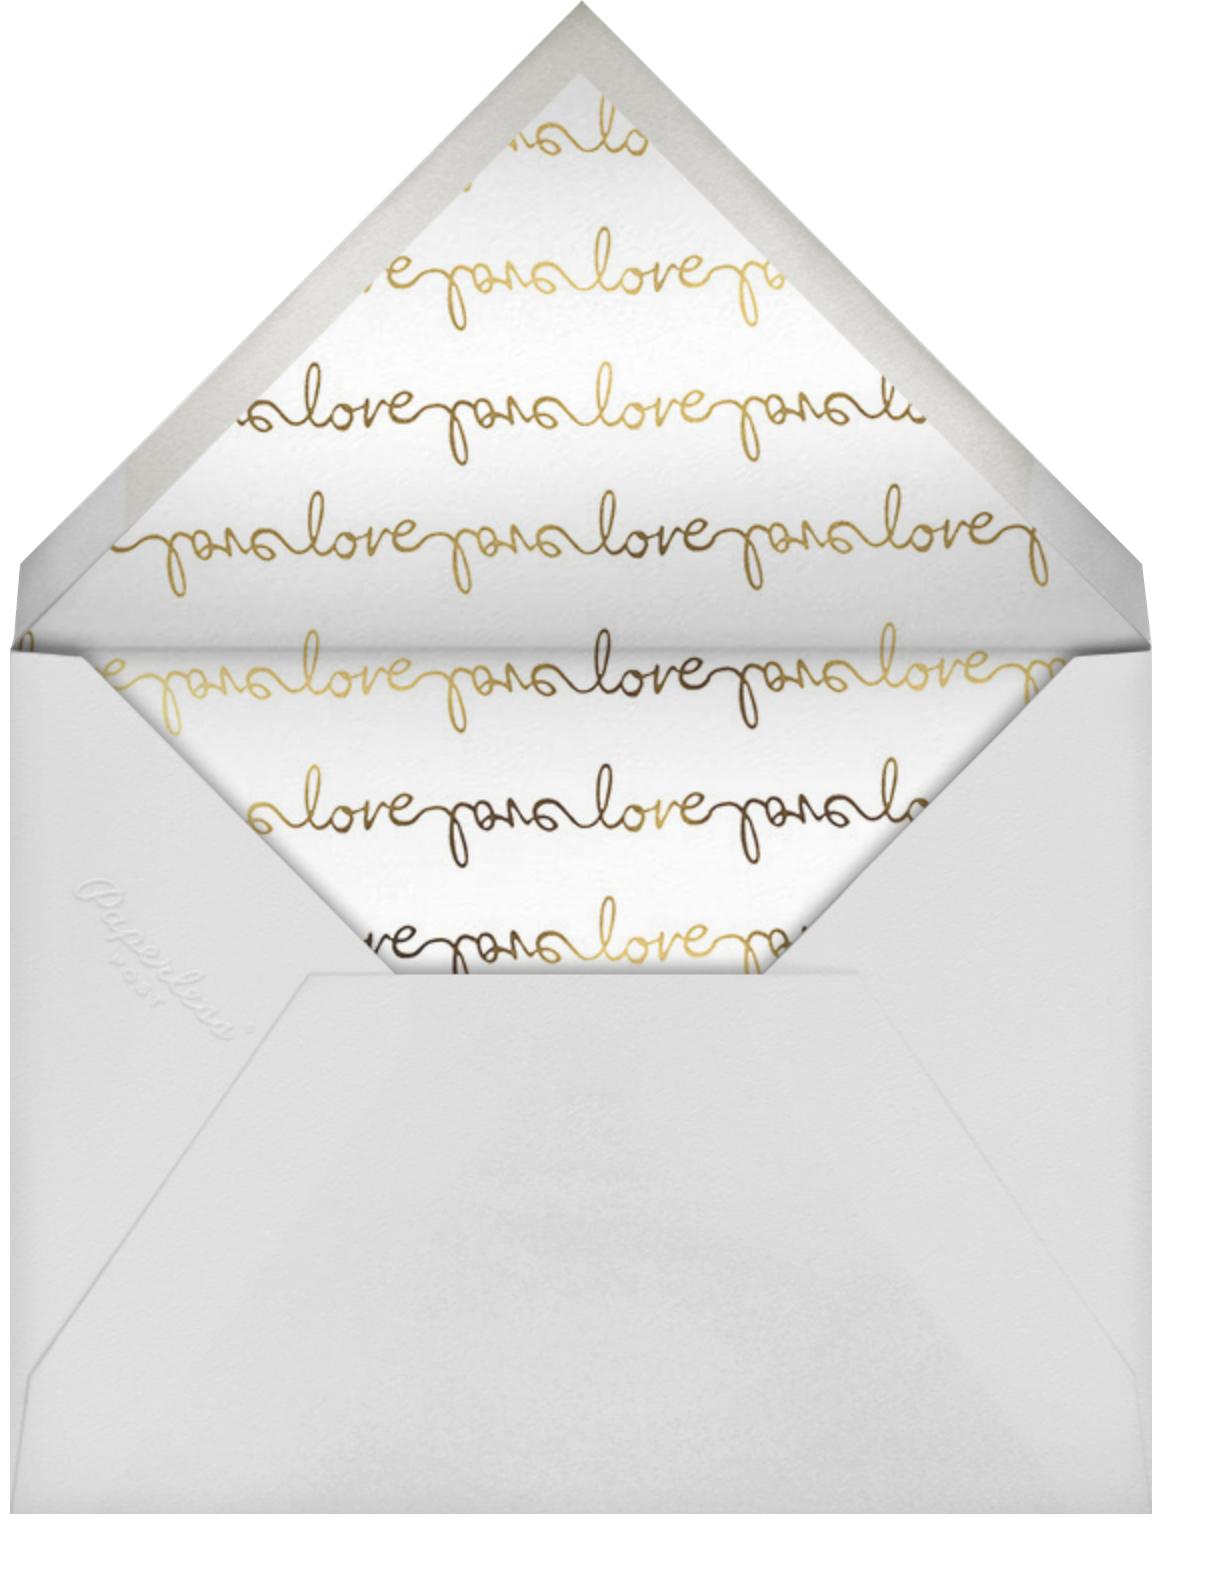 Thirds a Charm - Pavlova - kate spade new york - Save the date - envelope back